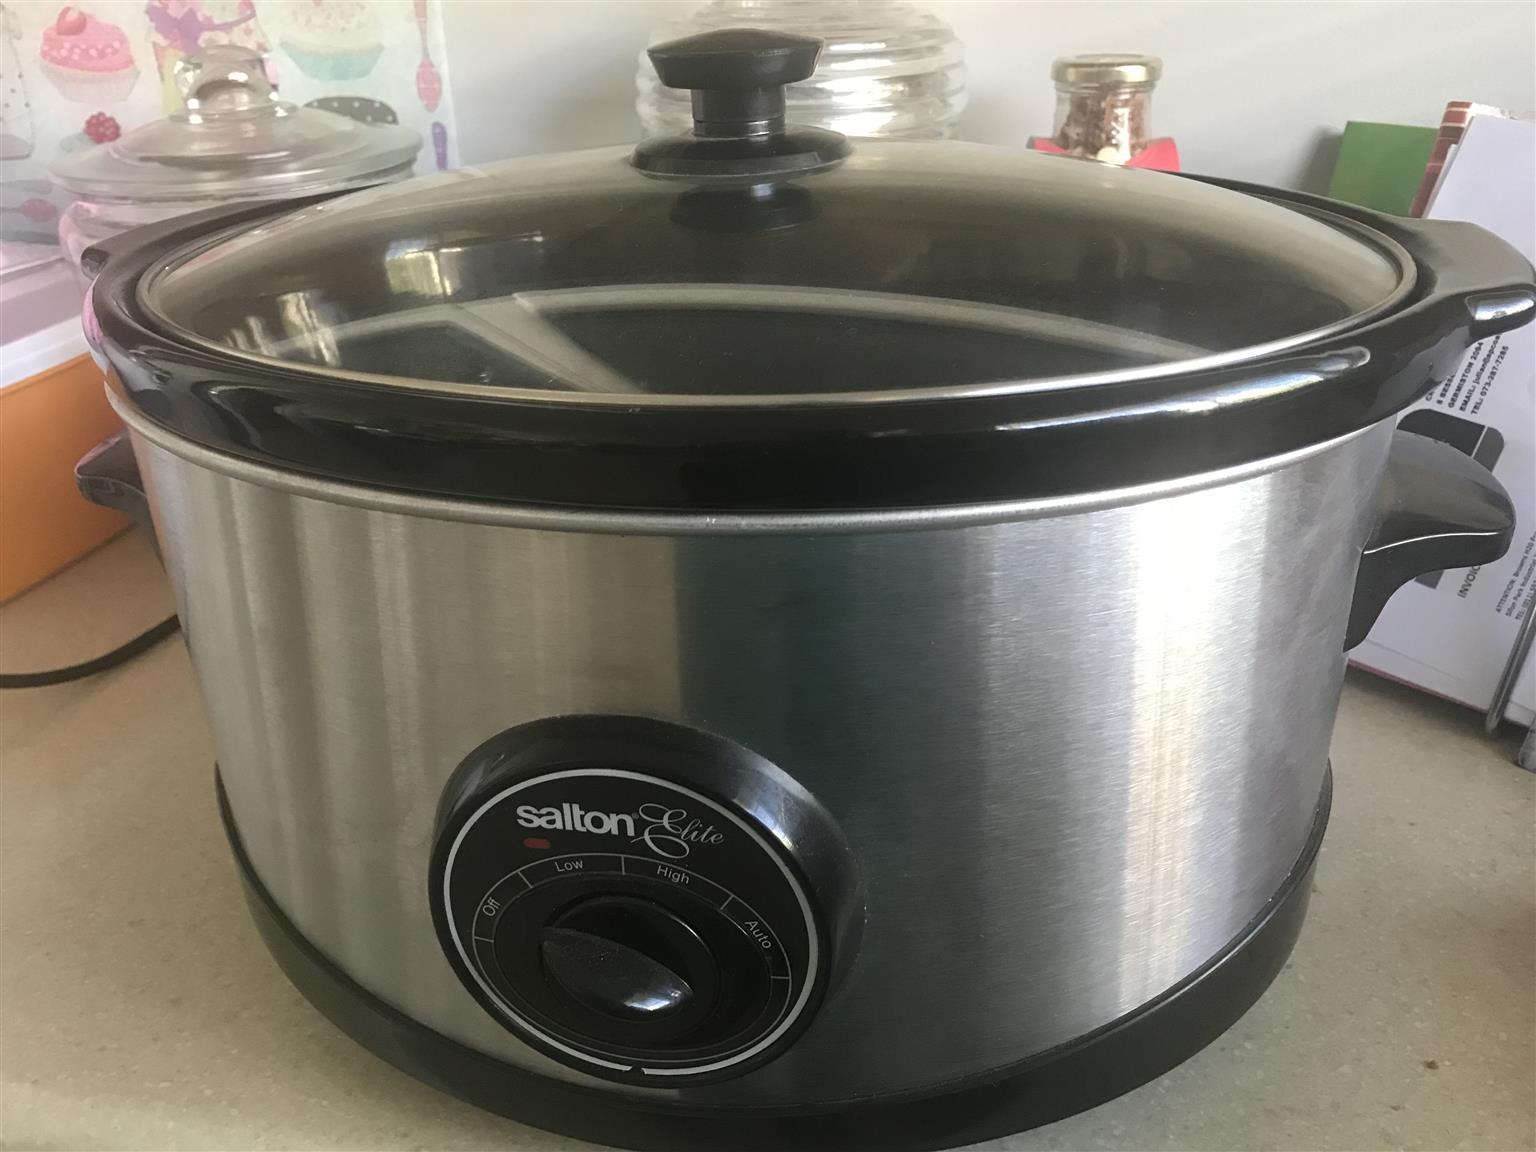 Salton Elite slow cooker